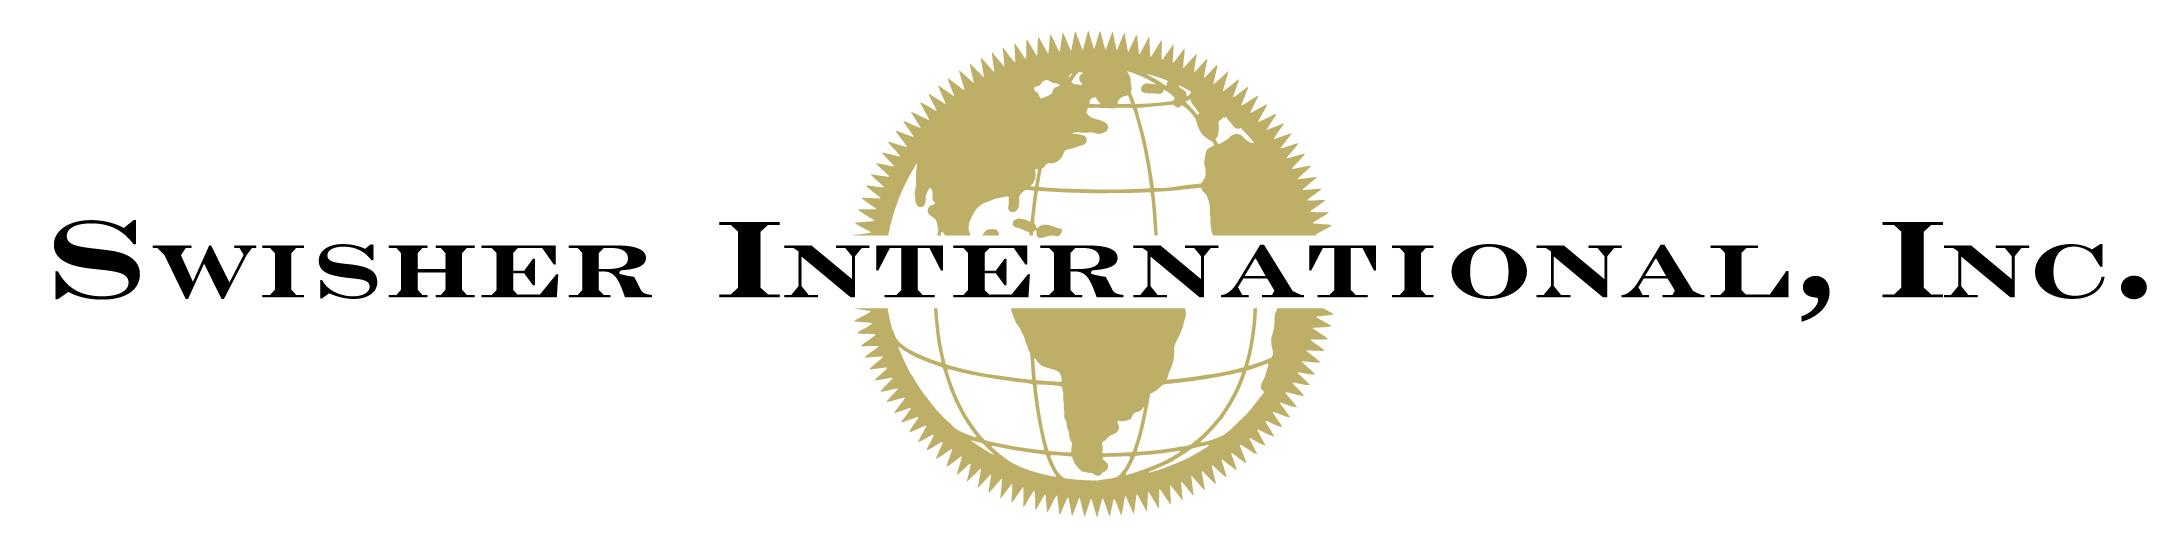 Swisher_International_Hospitality.jpg